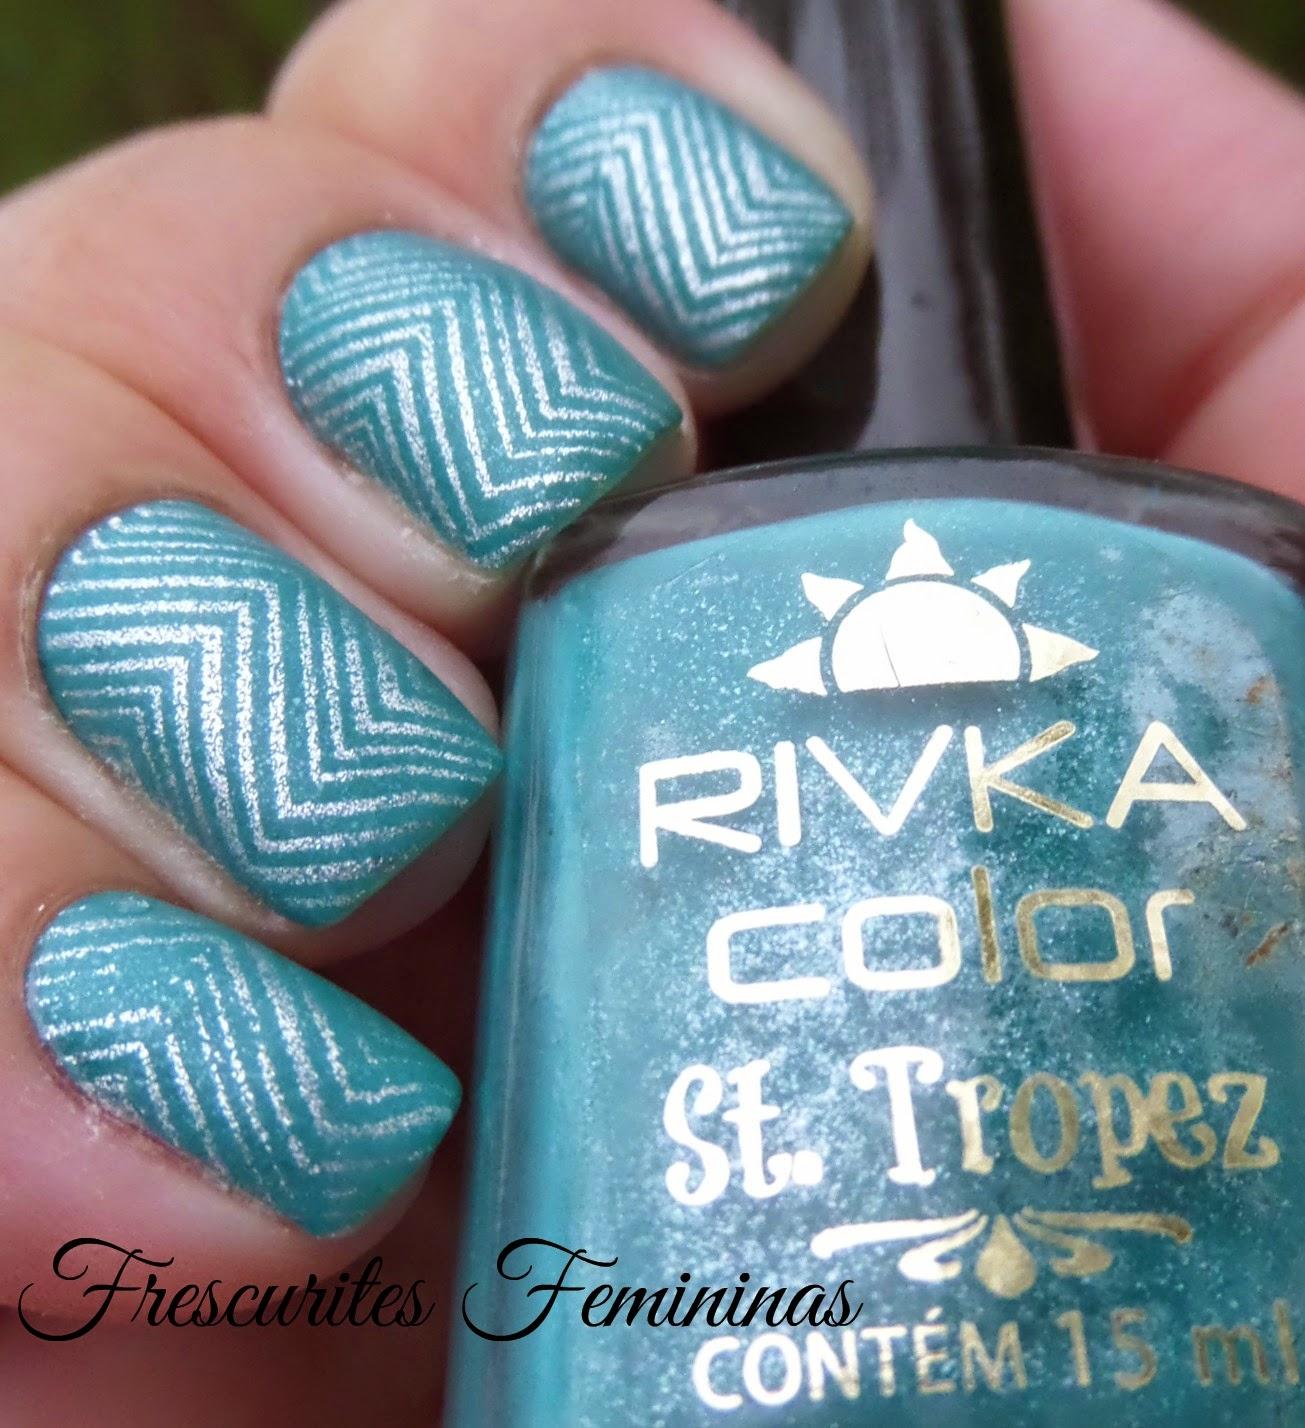 Rivka, Color, Fabi, Frescurites, Femininas, Nail, Polish